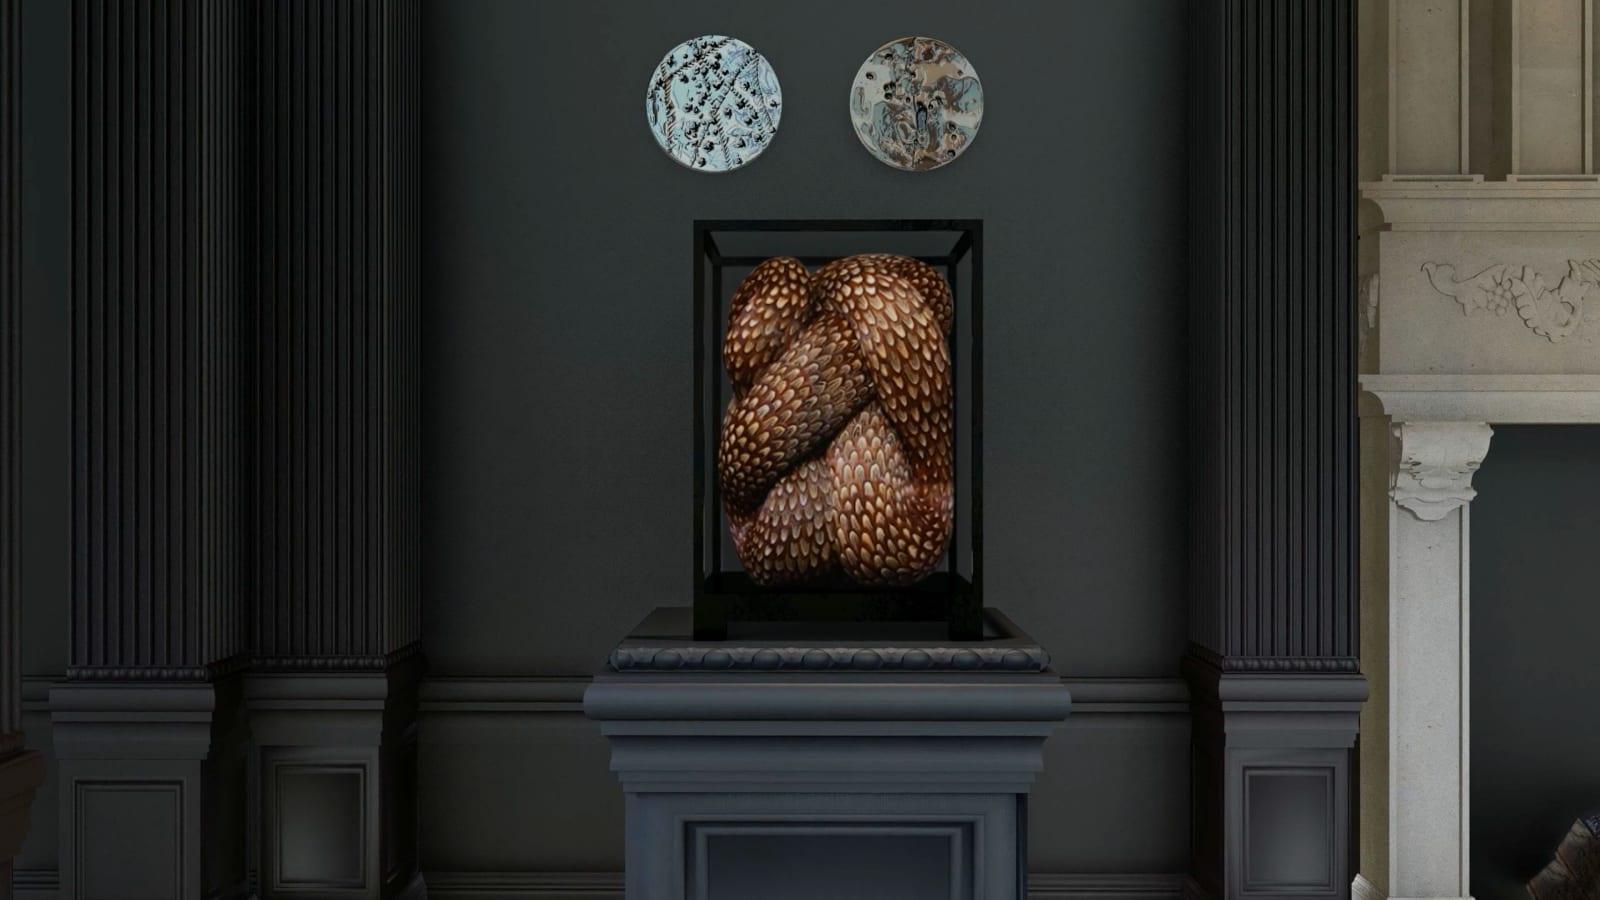 KATE MCCGWIRE Paradox , 2019 56.5 x 42.5 x 42.5 cm